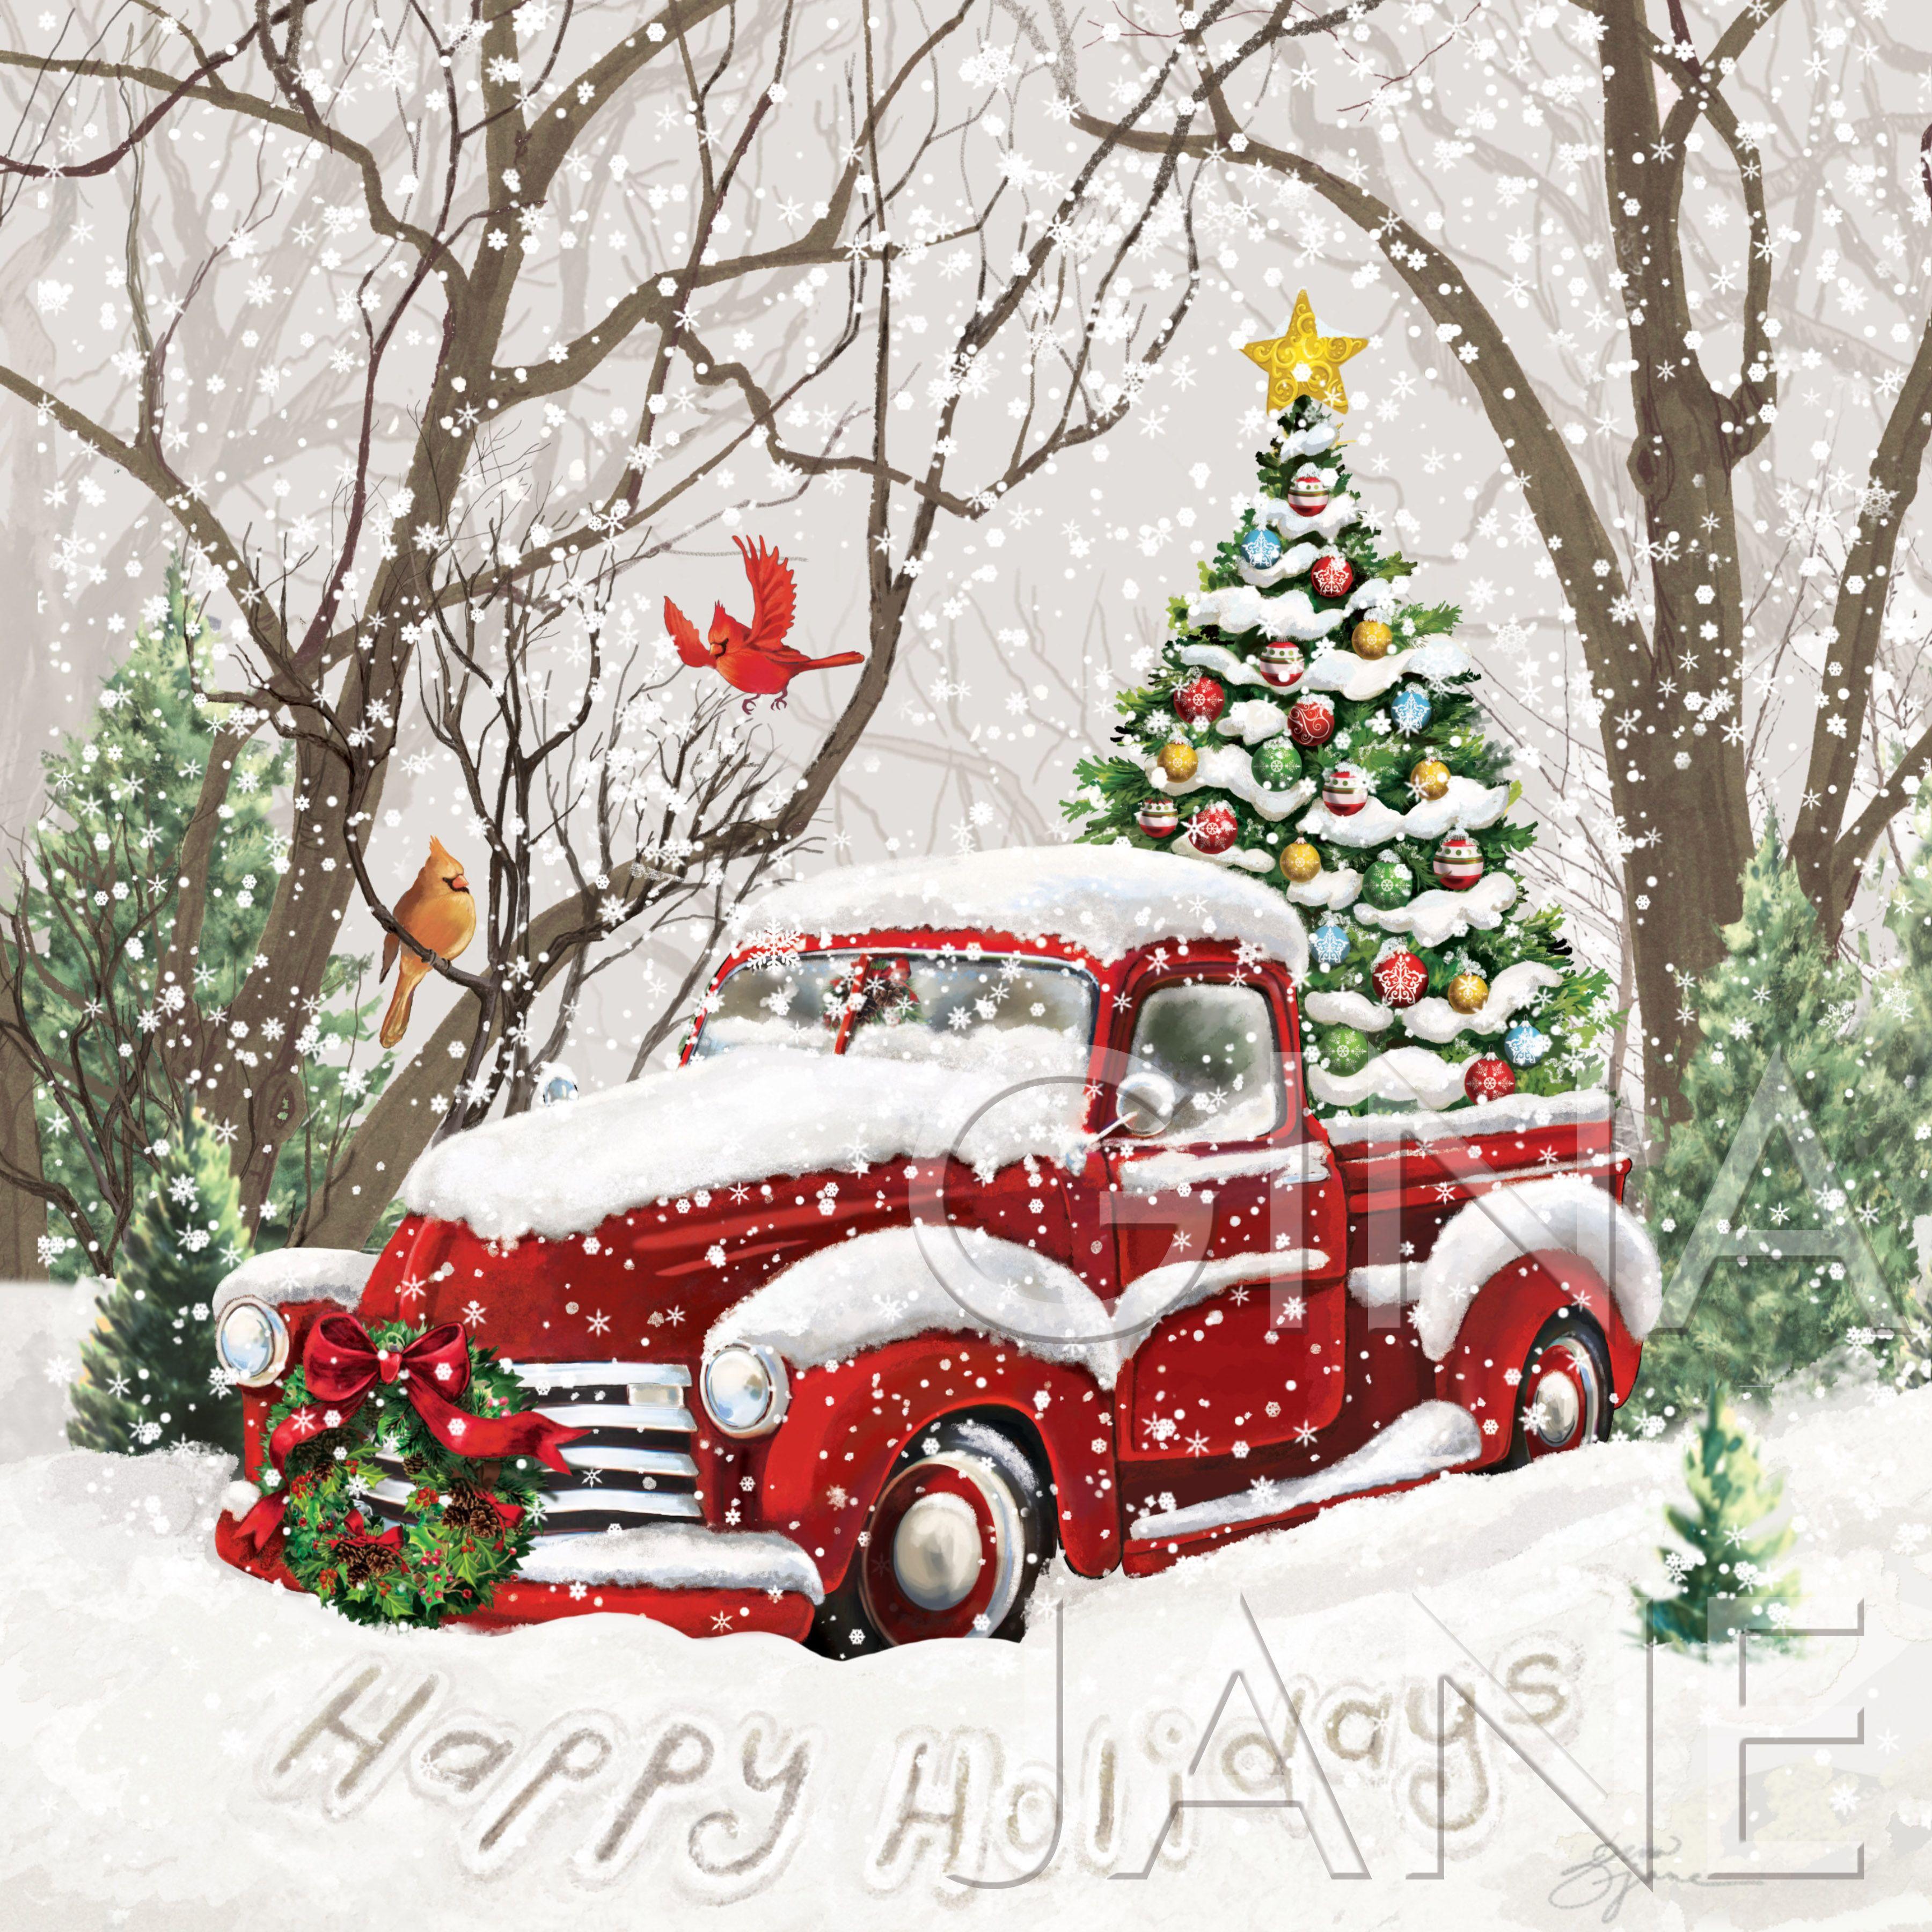 Vintage DIY Craft Decor Red Truck Christmas Tree Happy Holidays Printable Home Decor | Christmas ...